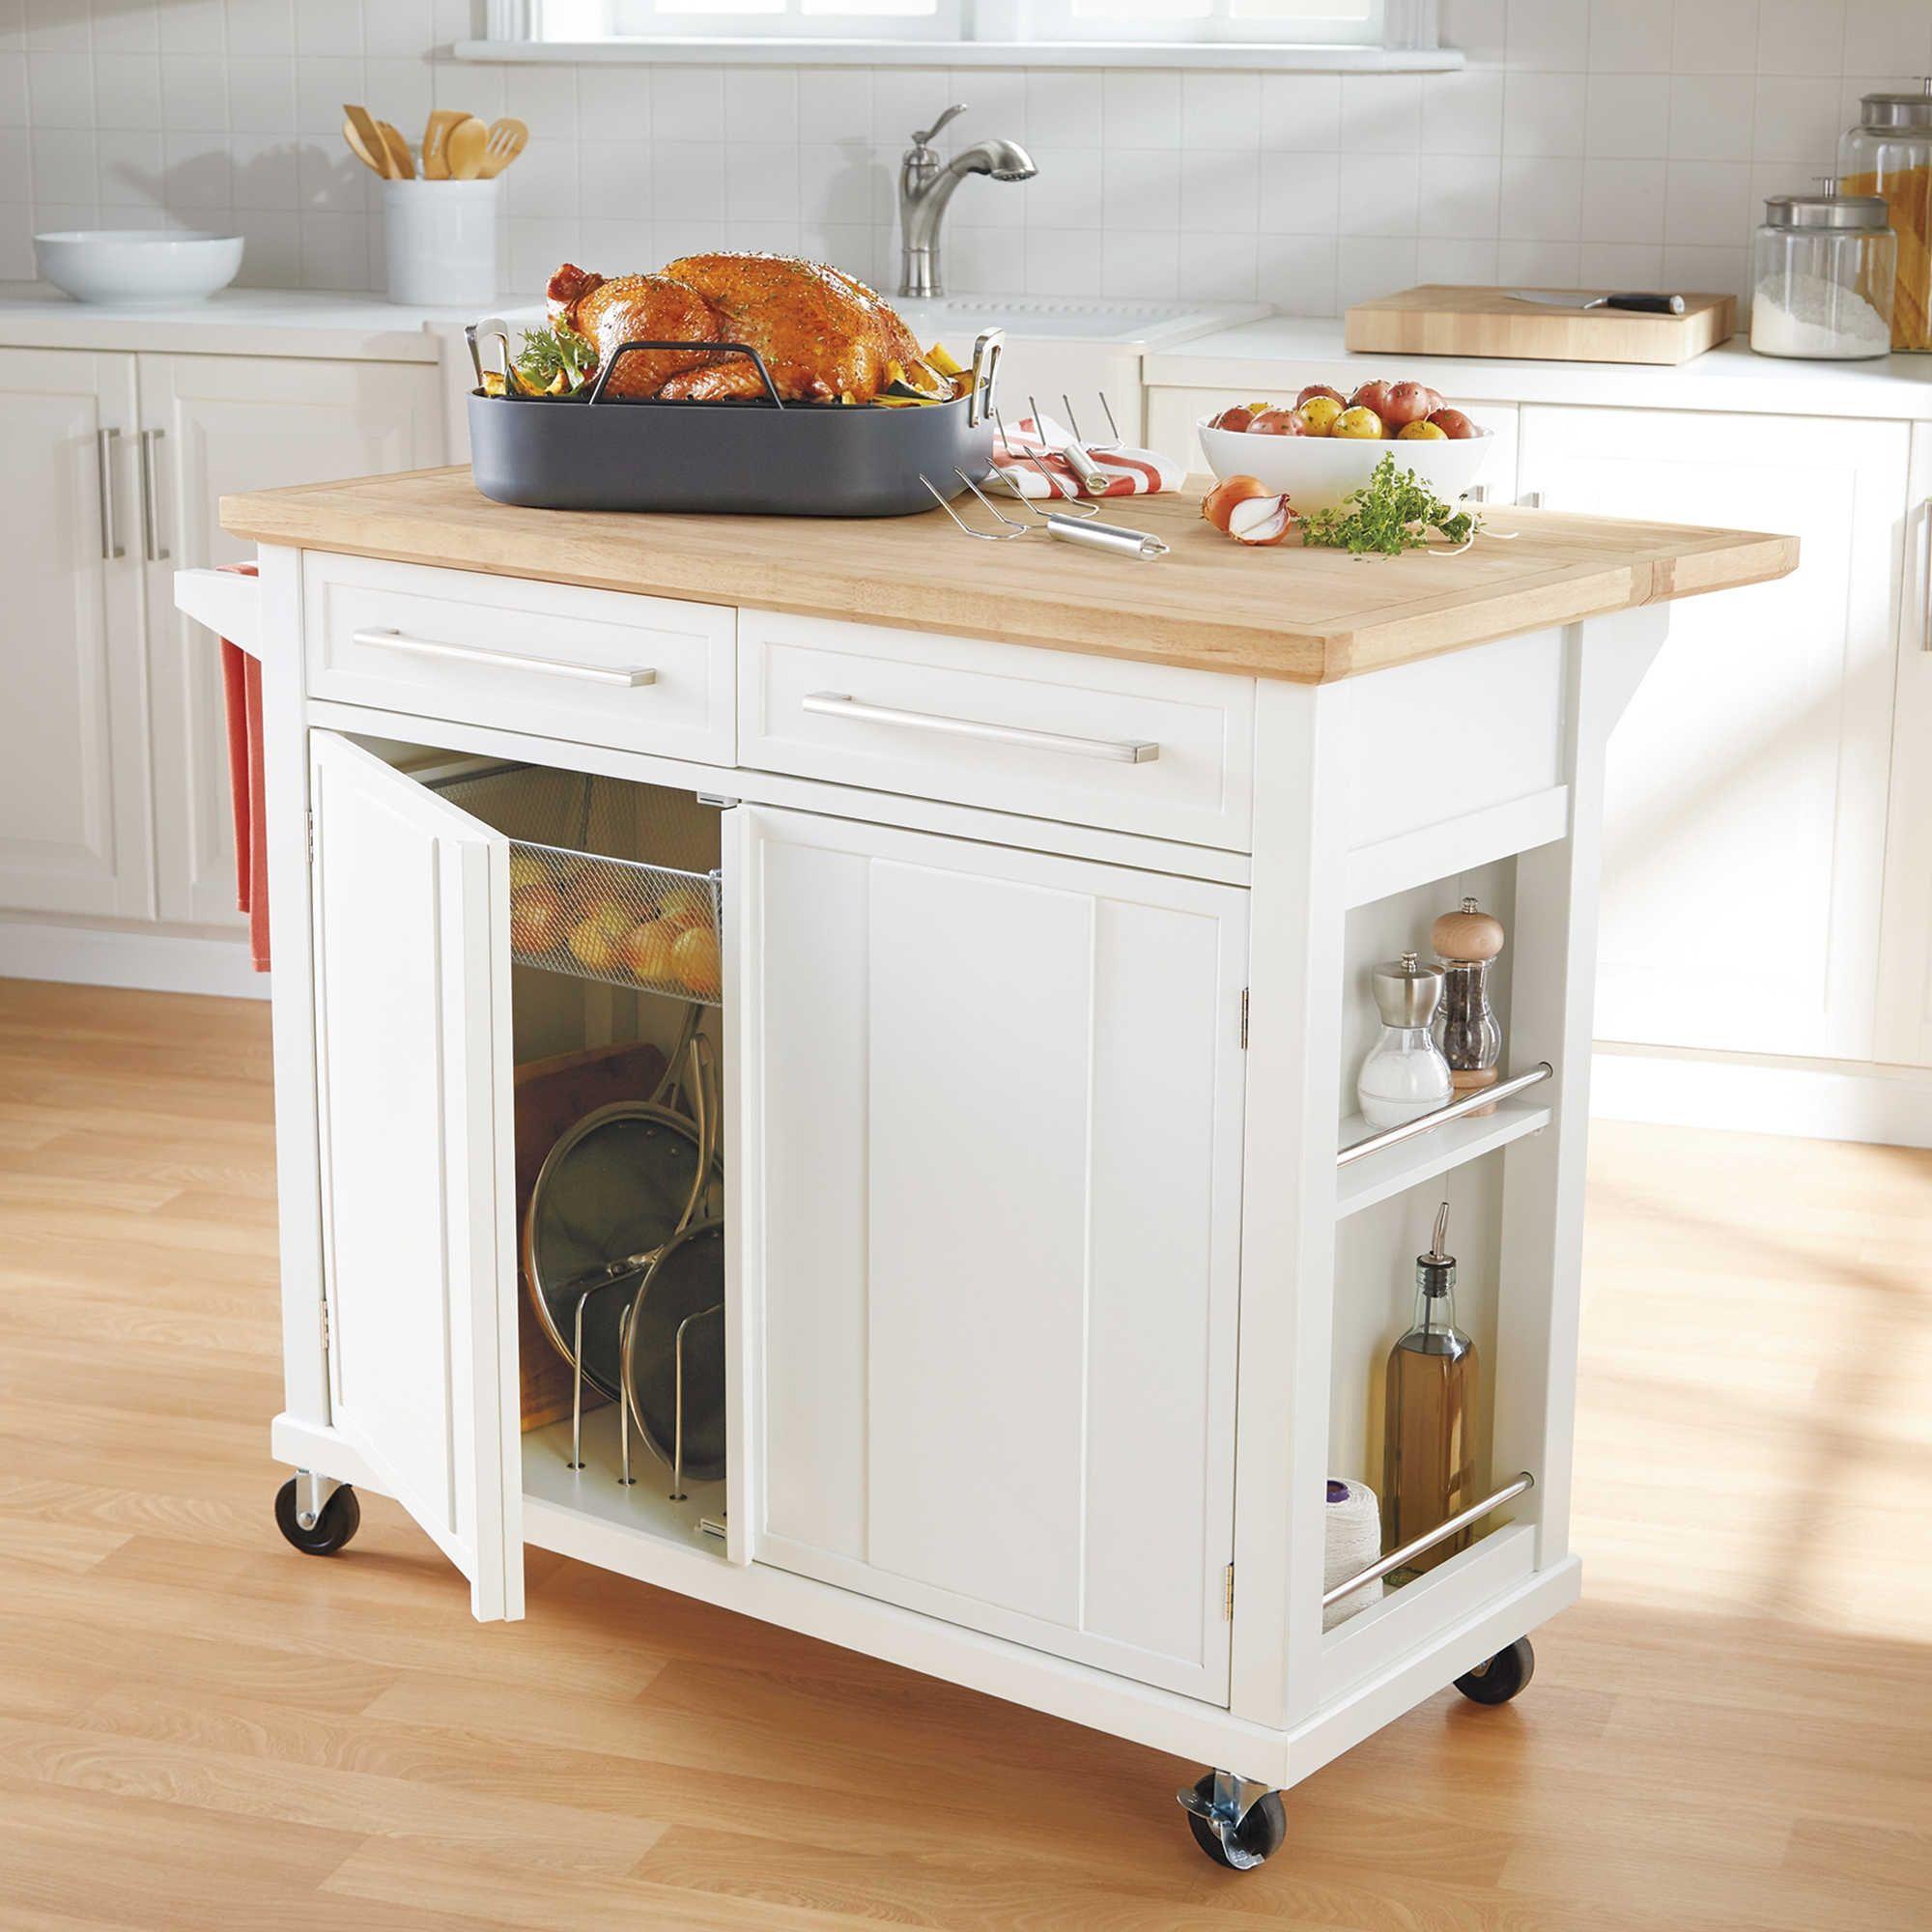 Threshold Kitchen Island With Wine Rack | http://navigator-spb.info ...